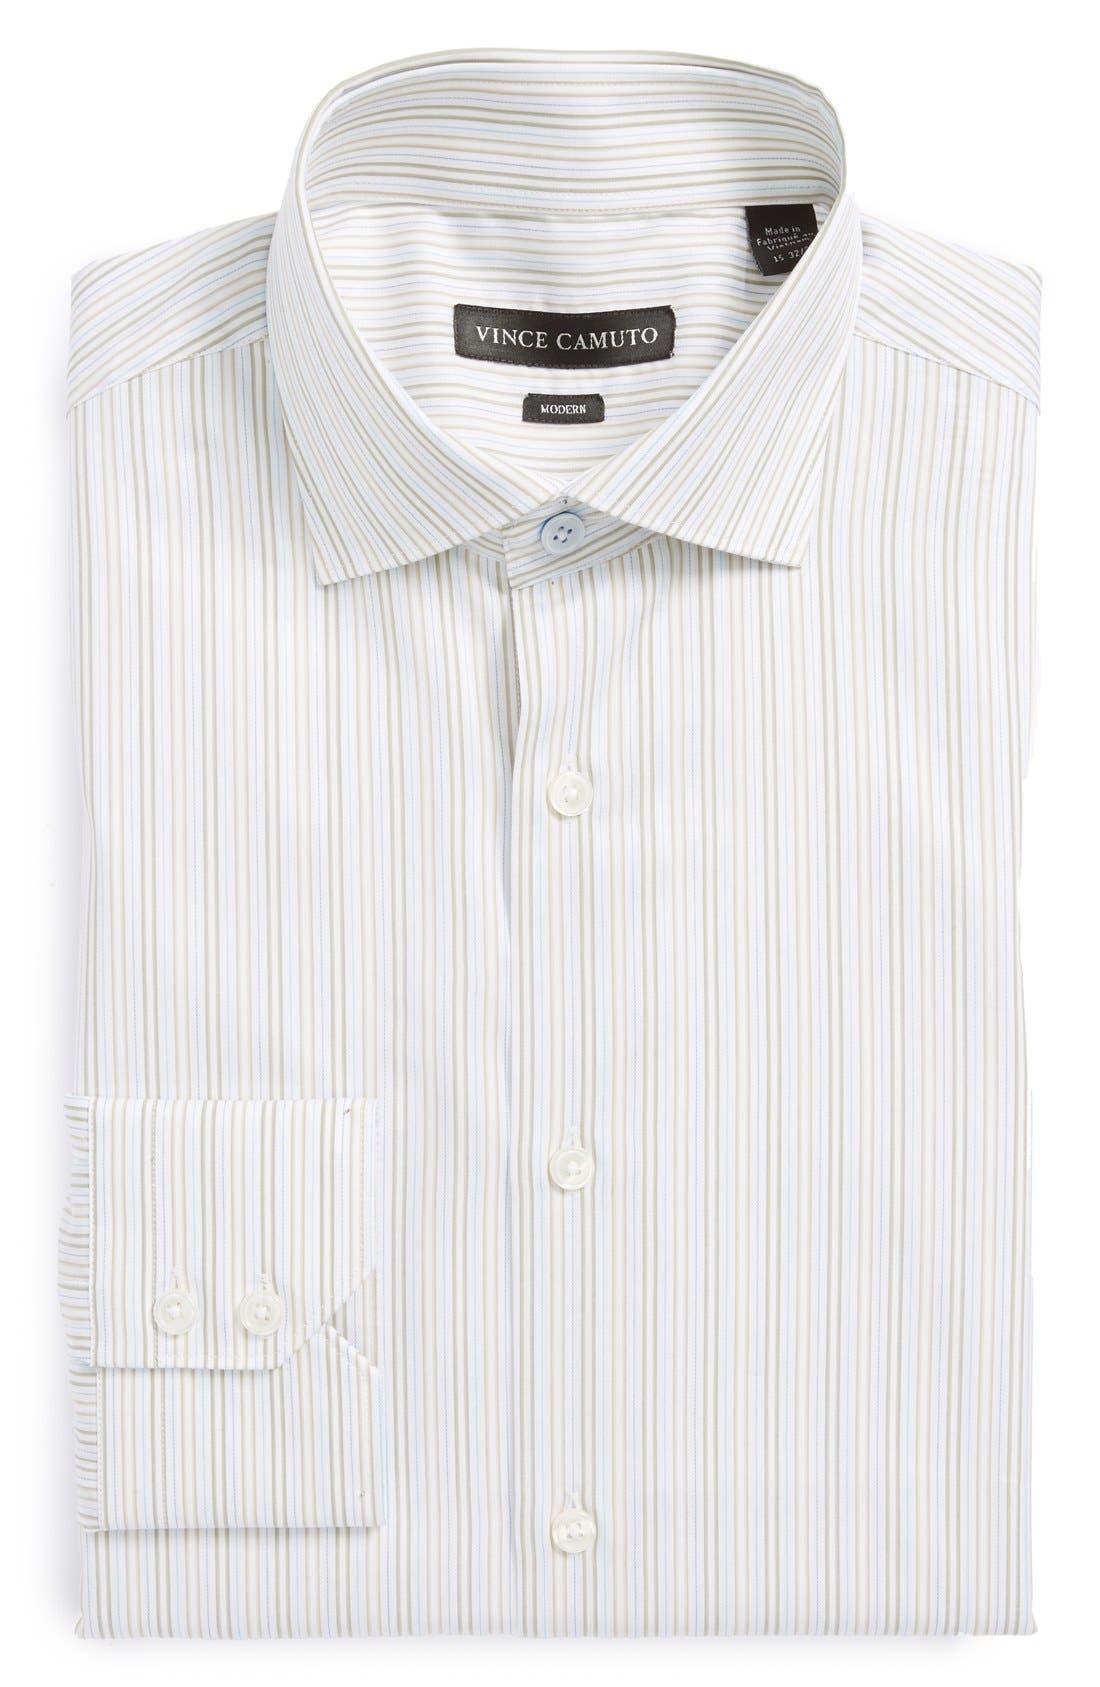 Main Image - Vince Camuto Modern Fit Stripe Dress Shirt